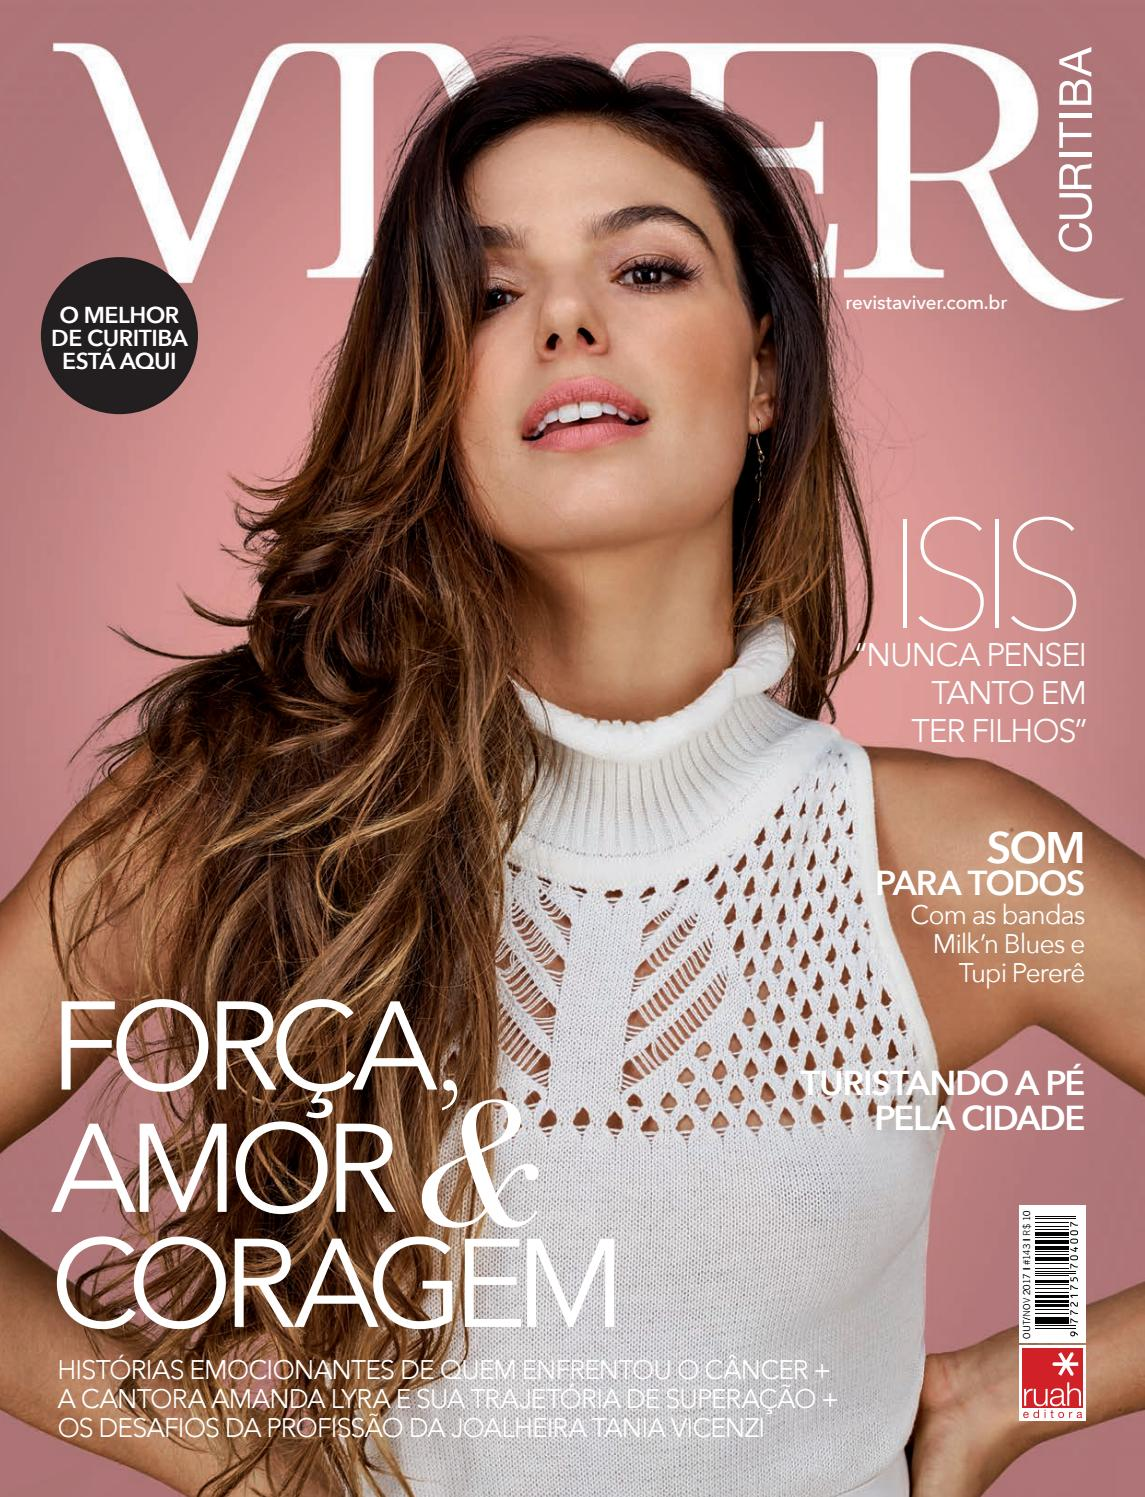 14da832f208f0 VIVER Curitiba143 by Viver Curitiba - issuu